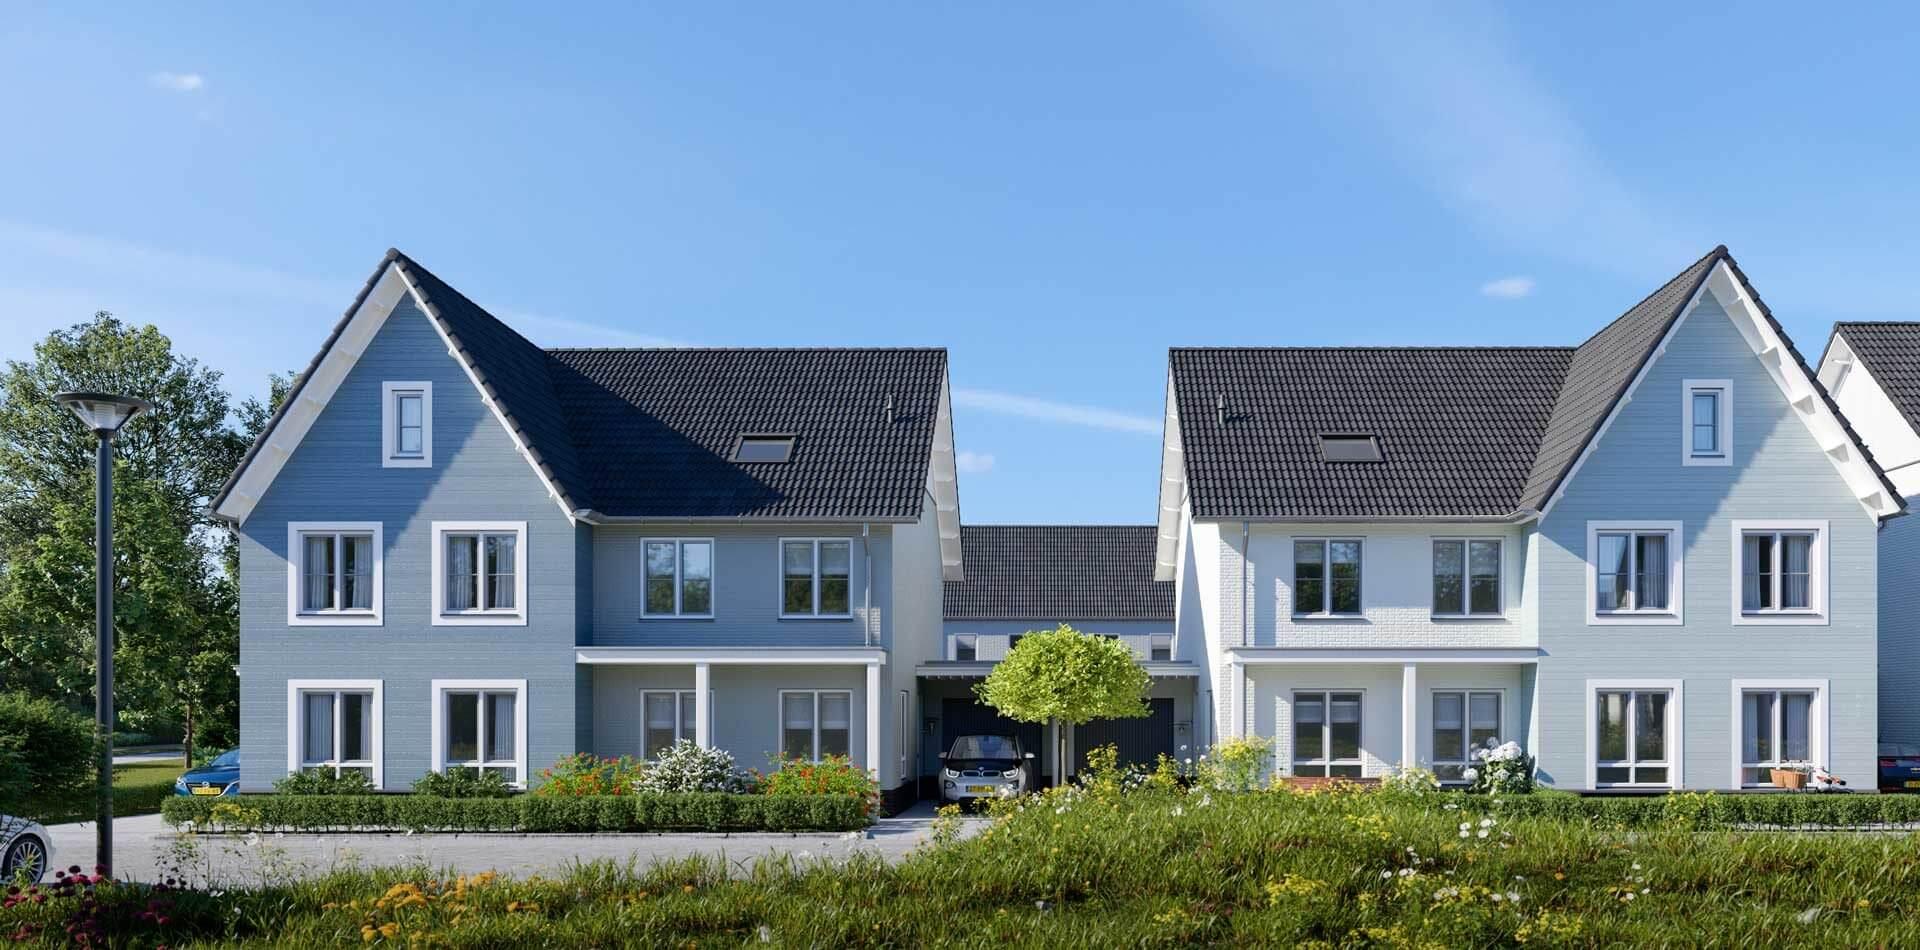 Zuiderpark-Tilburg-Werk-yoreM-Koopwoningen